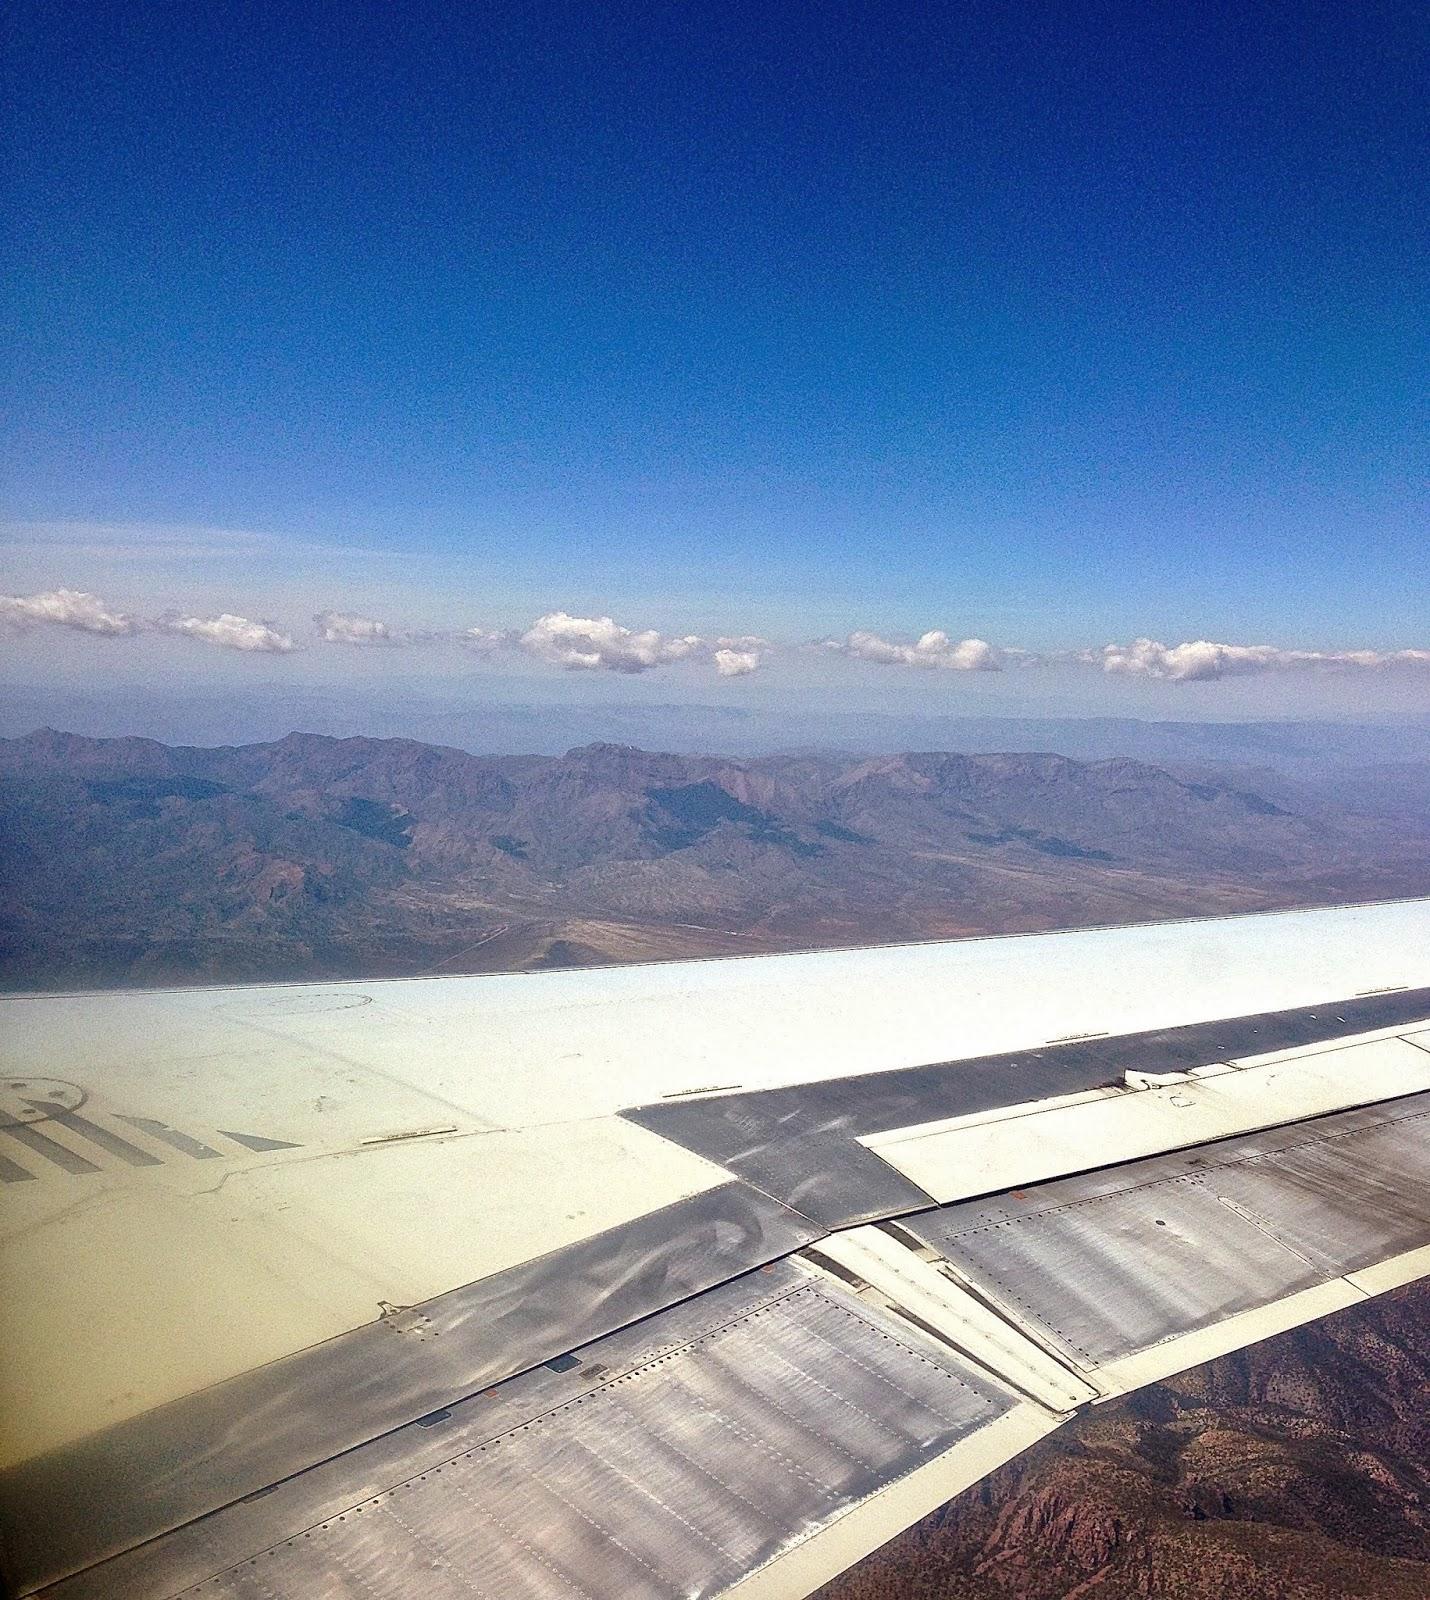 EmmasBeginning What Scares You? #fear #flying emmasbeginning.bloggspot.com